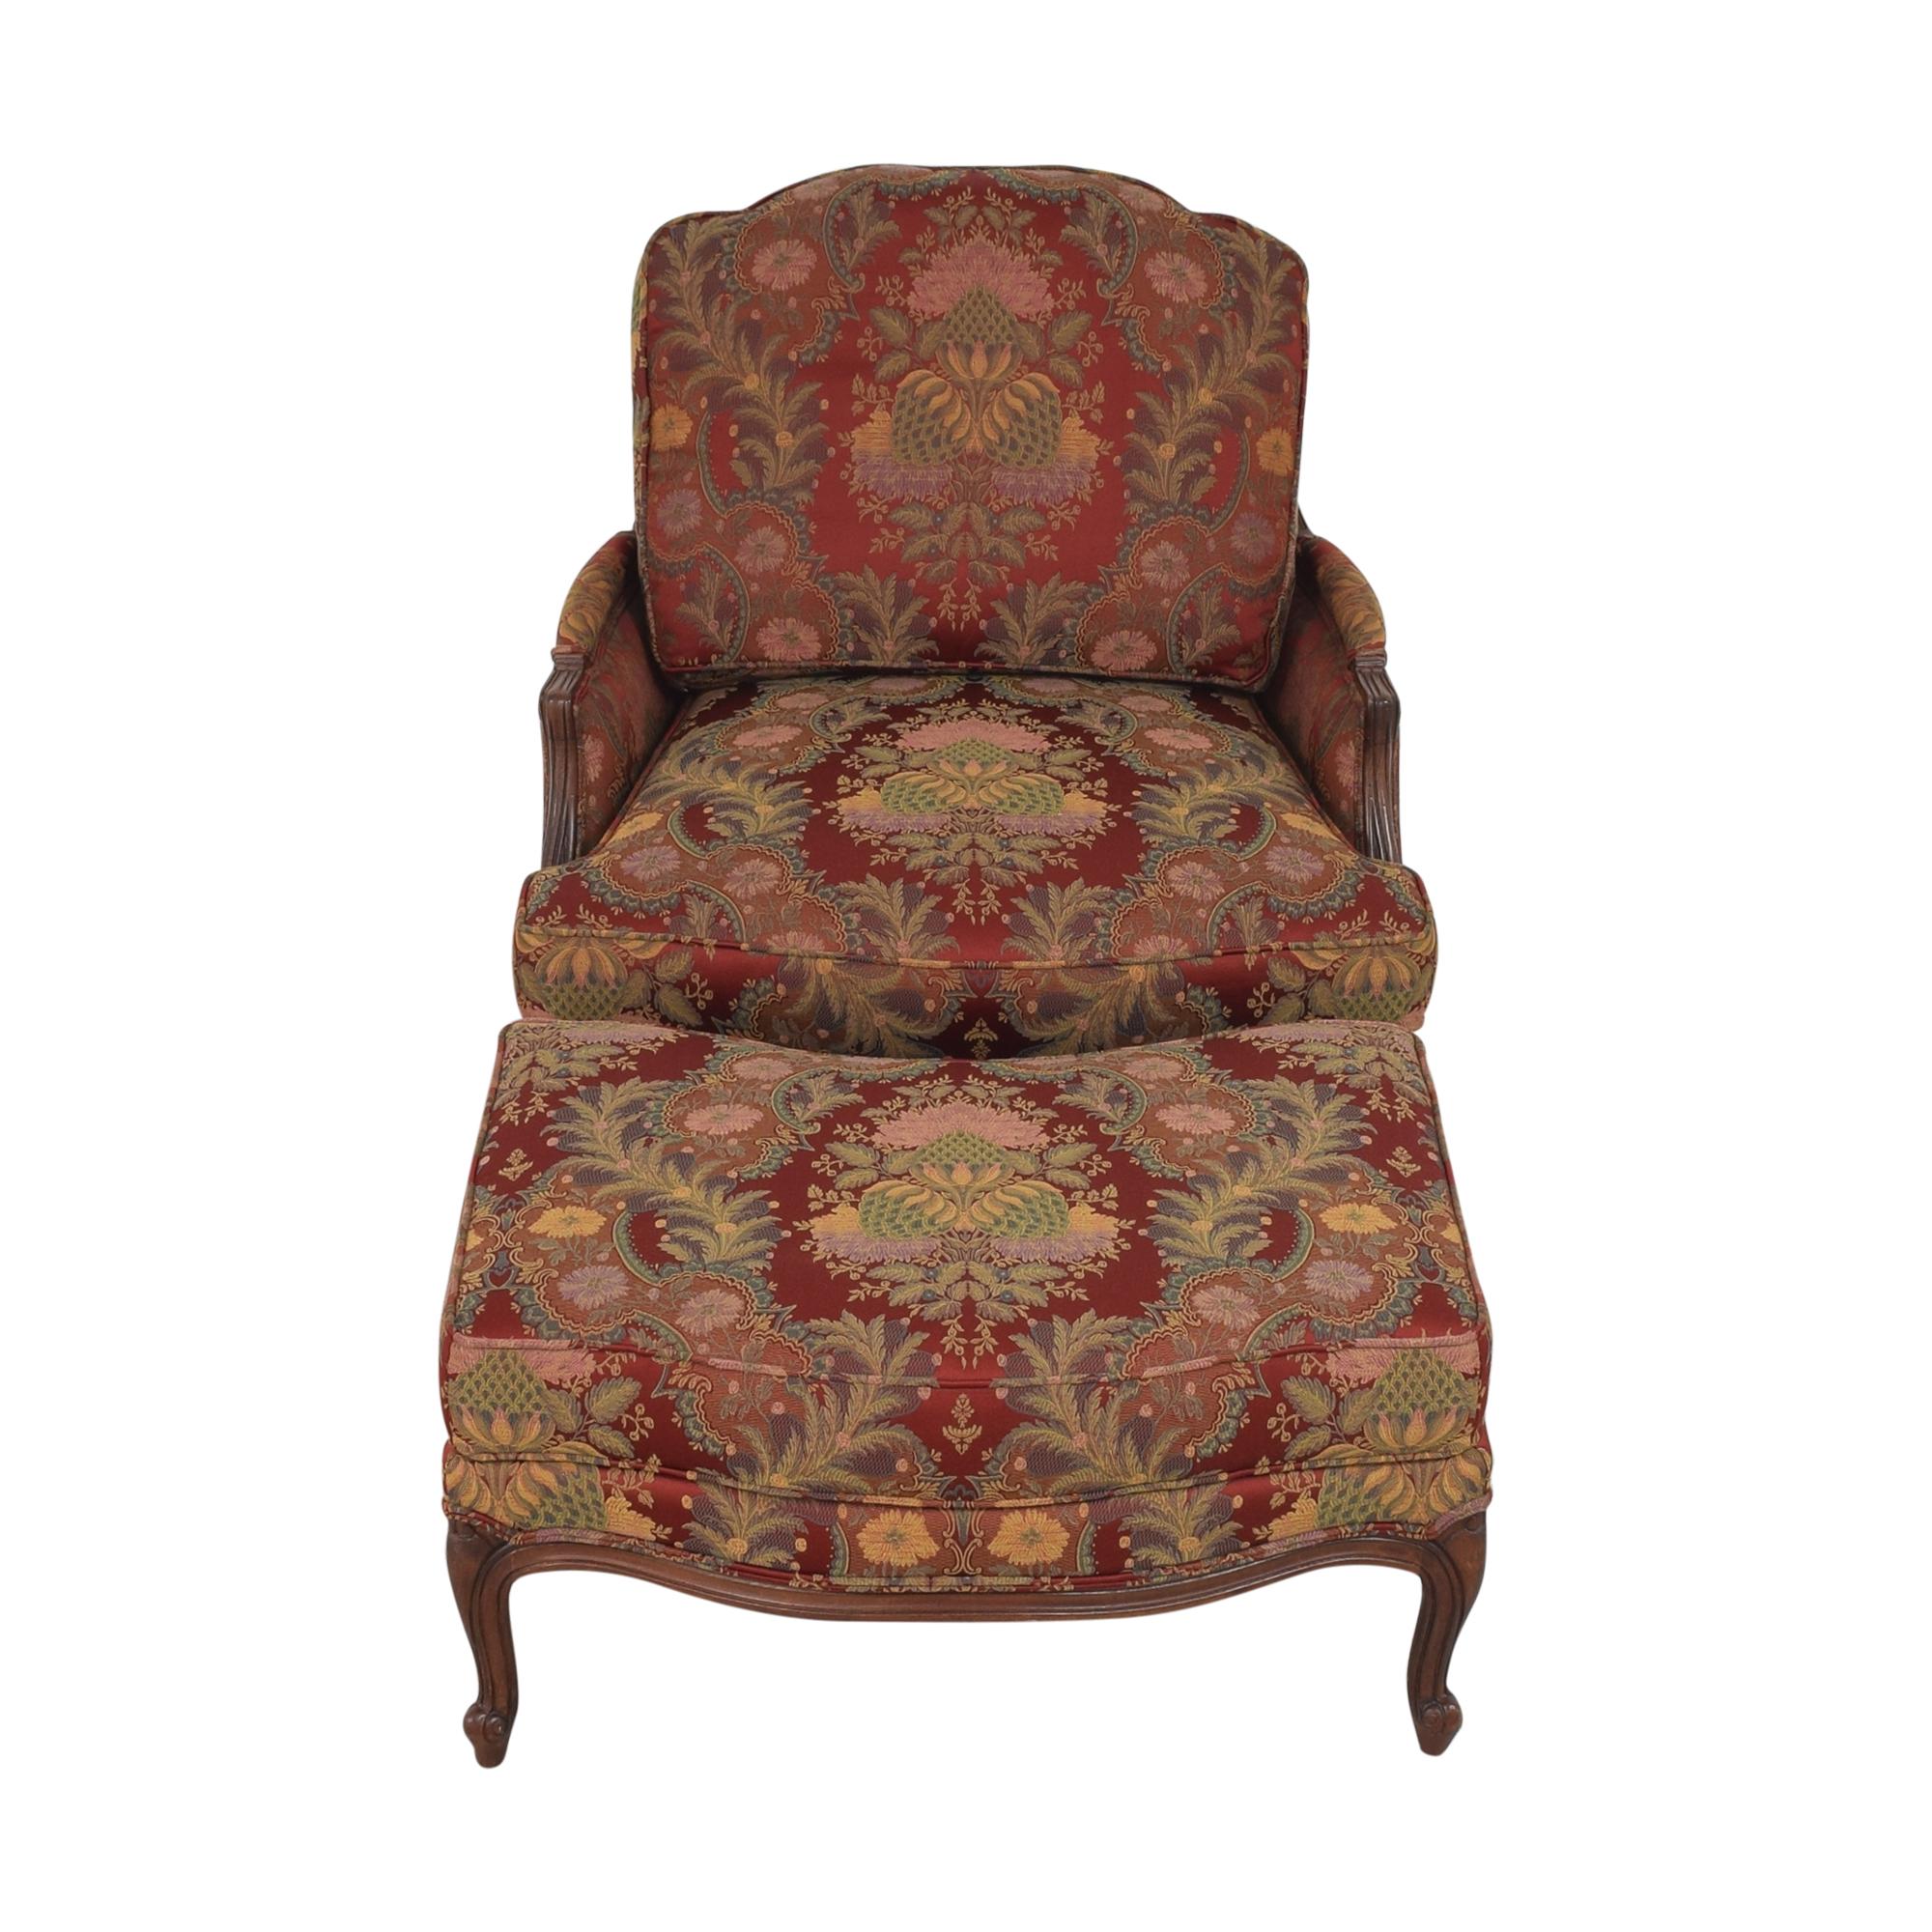 Ethan Allen Ethan Allen Versailles Chair with Ottoman discount